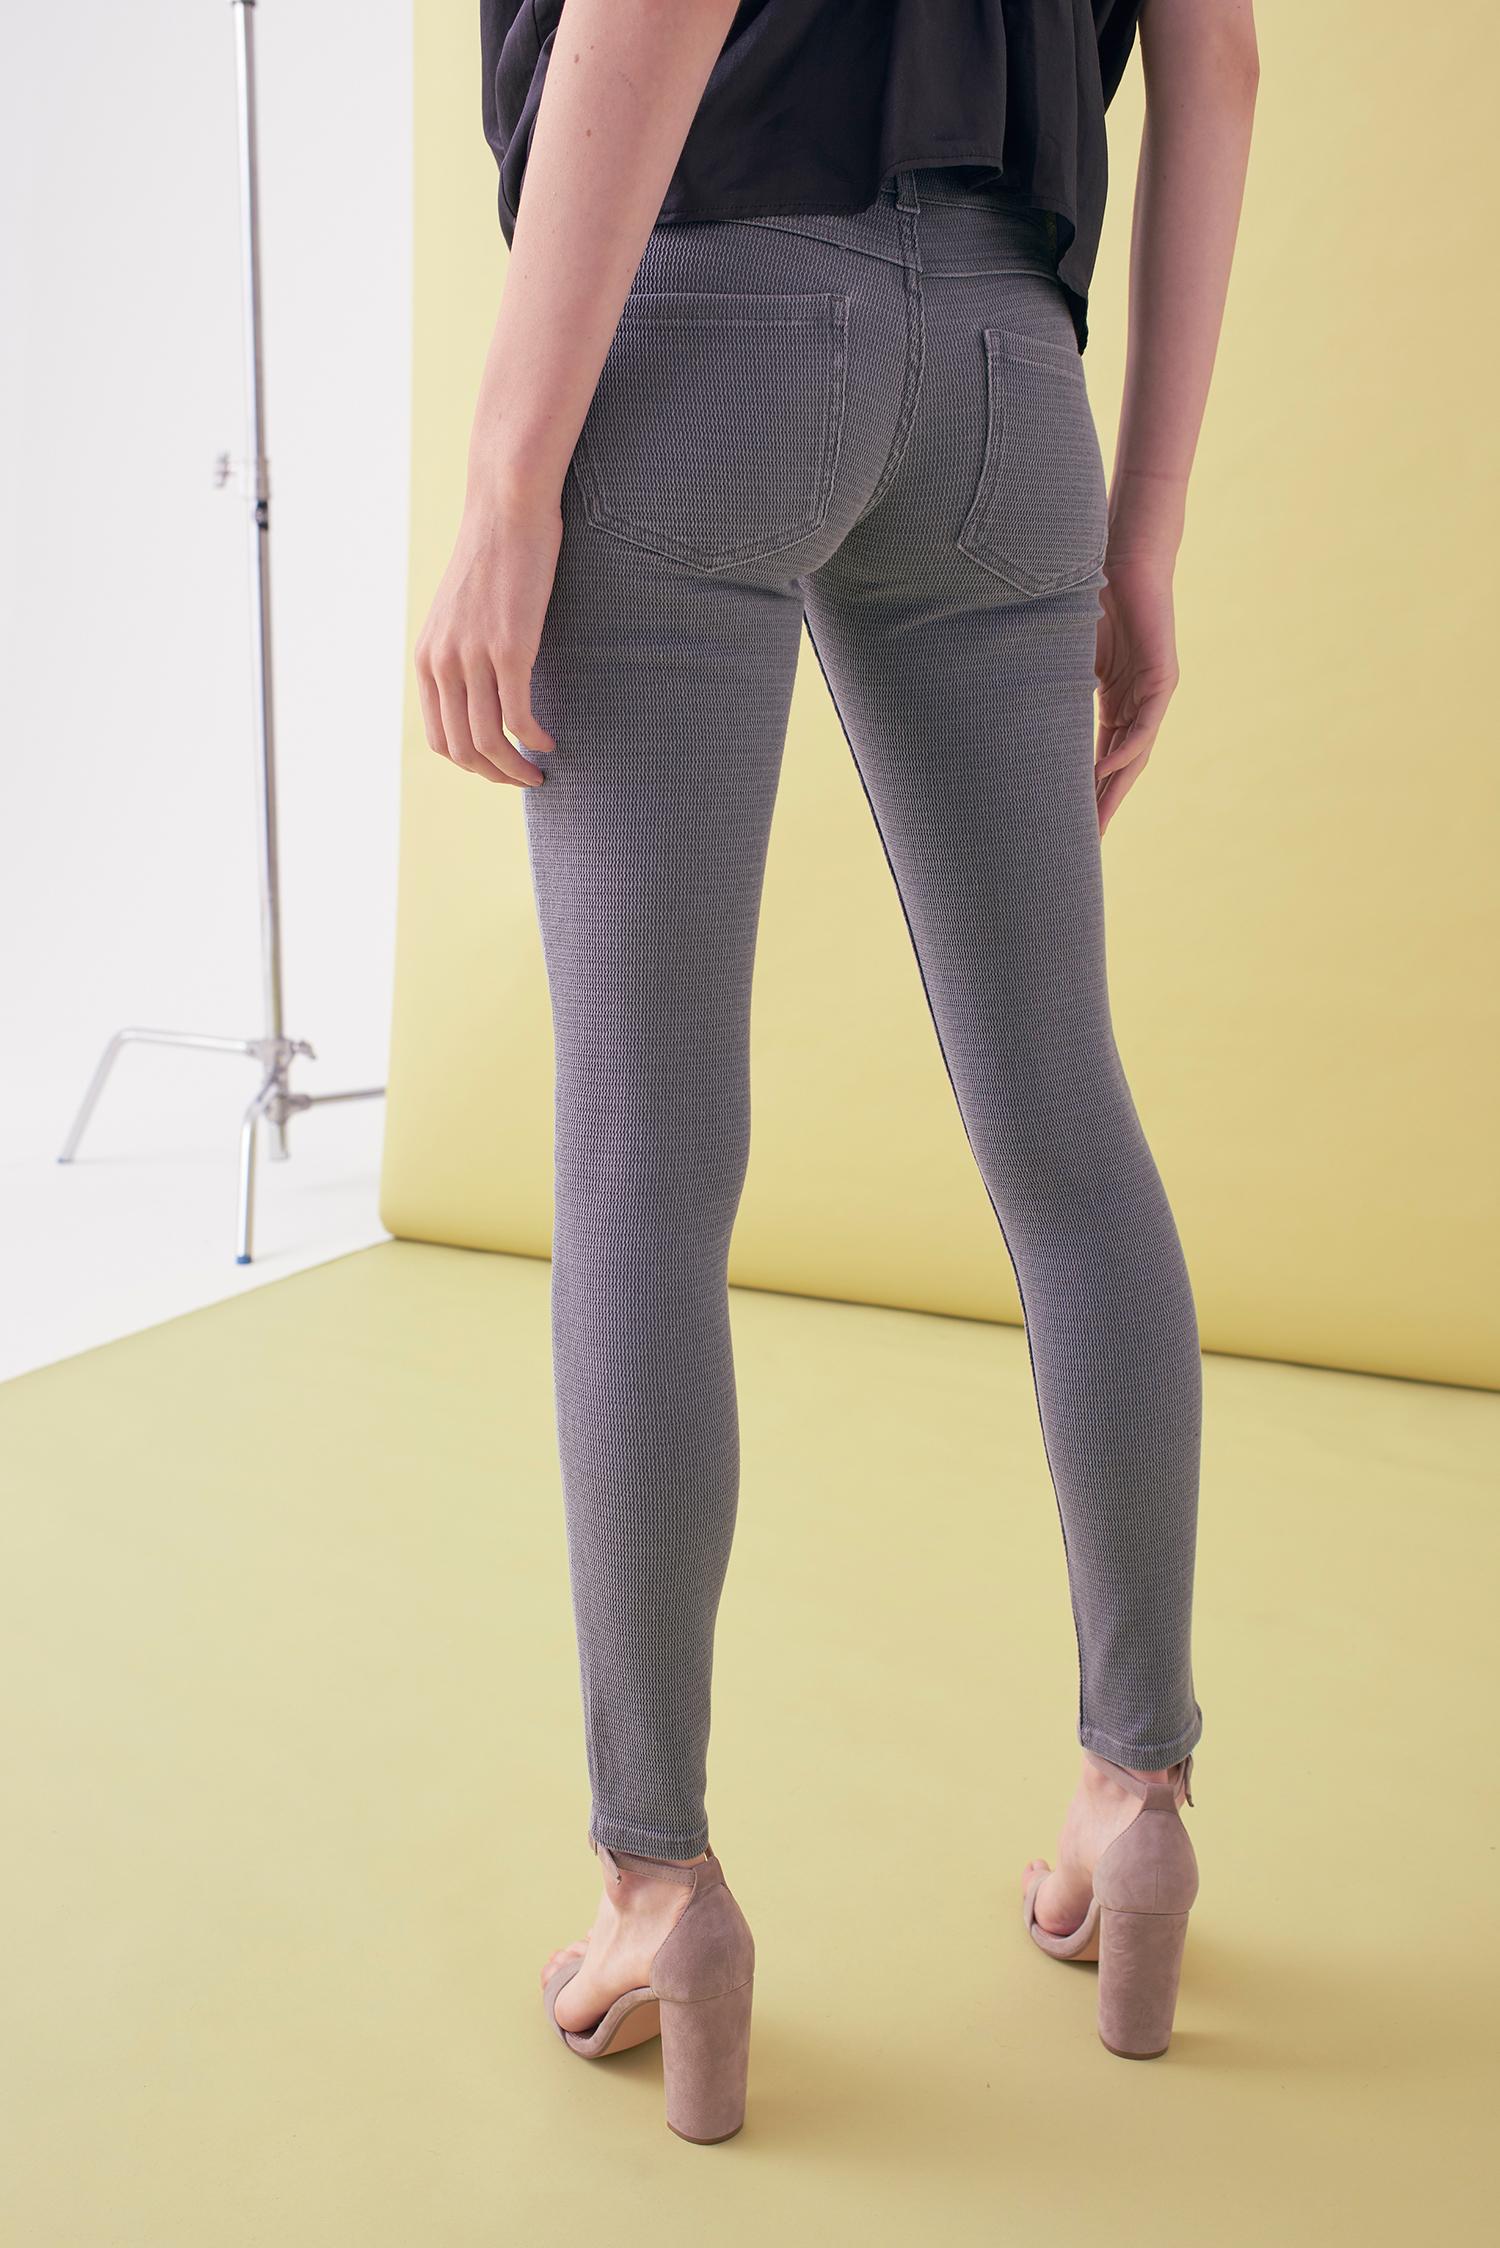 Sarah_Swann_SS17_09_Textured_Stretch_Cotton_Skinny_Trouser_Pewter_B.jpg